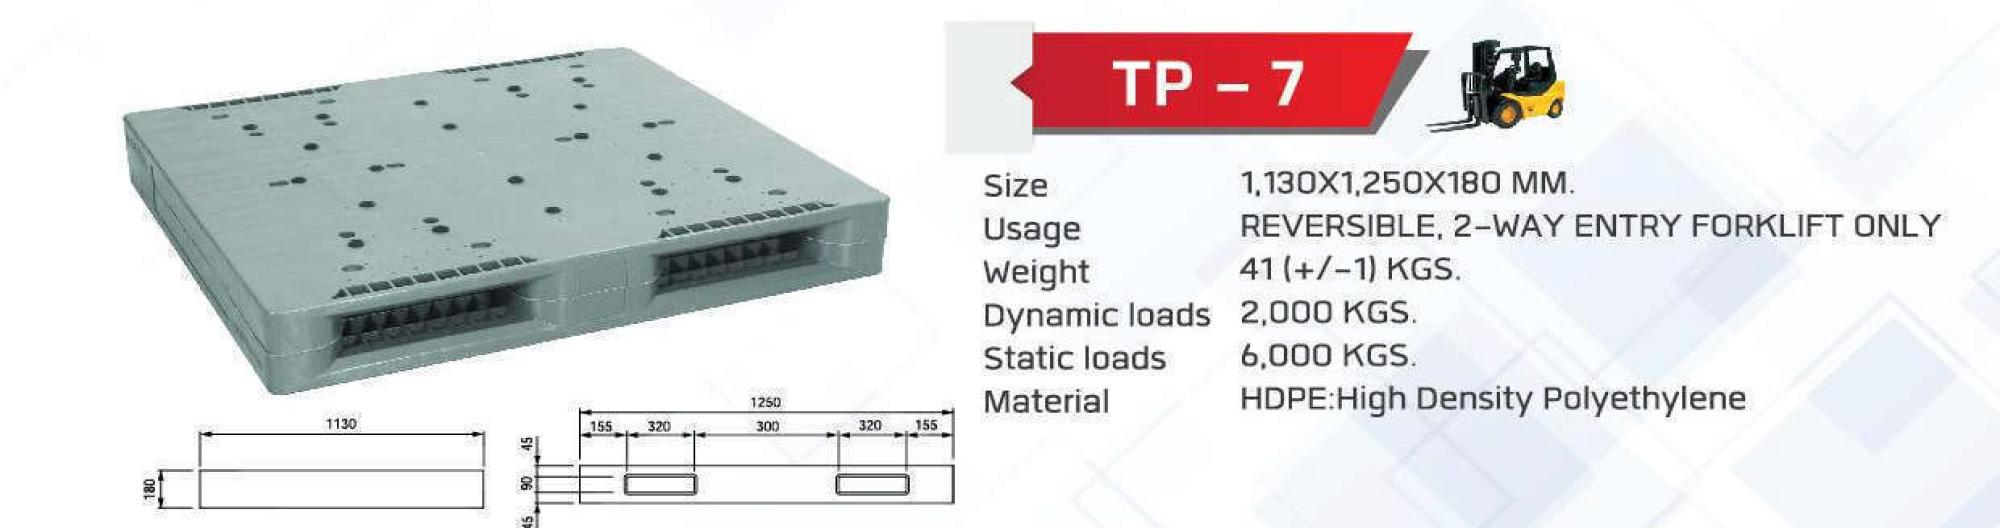 Reversible-HeavyDuty-TP-7